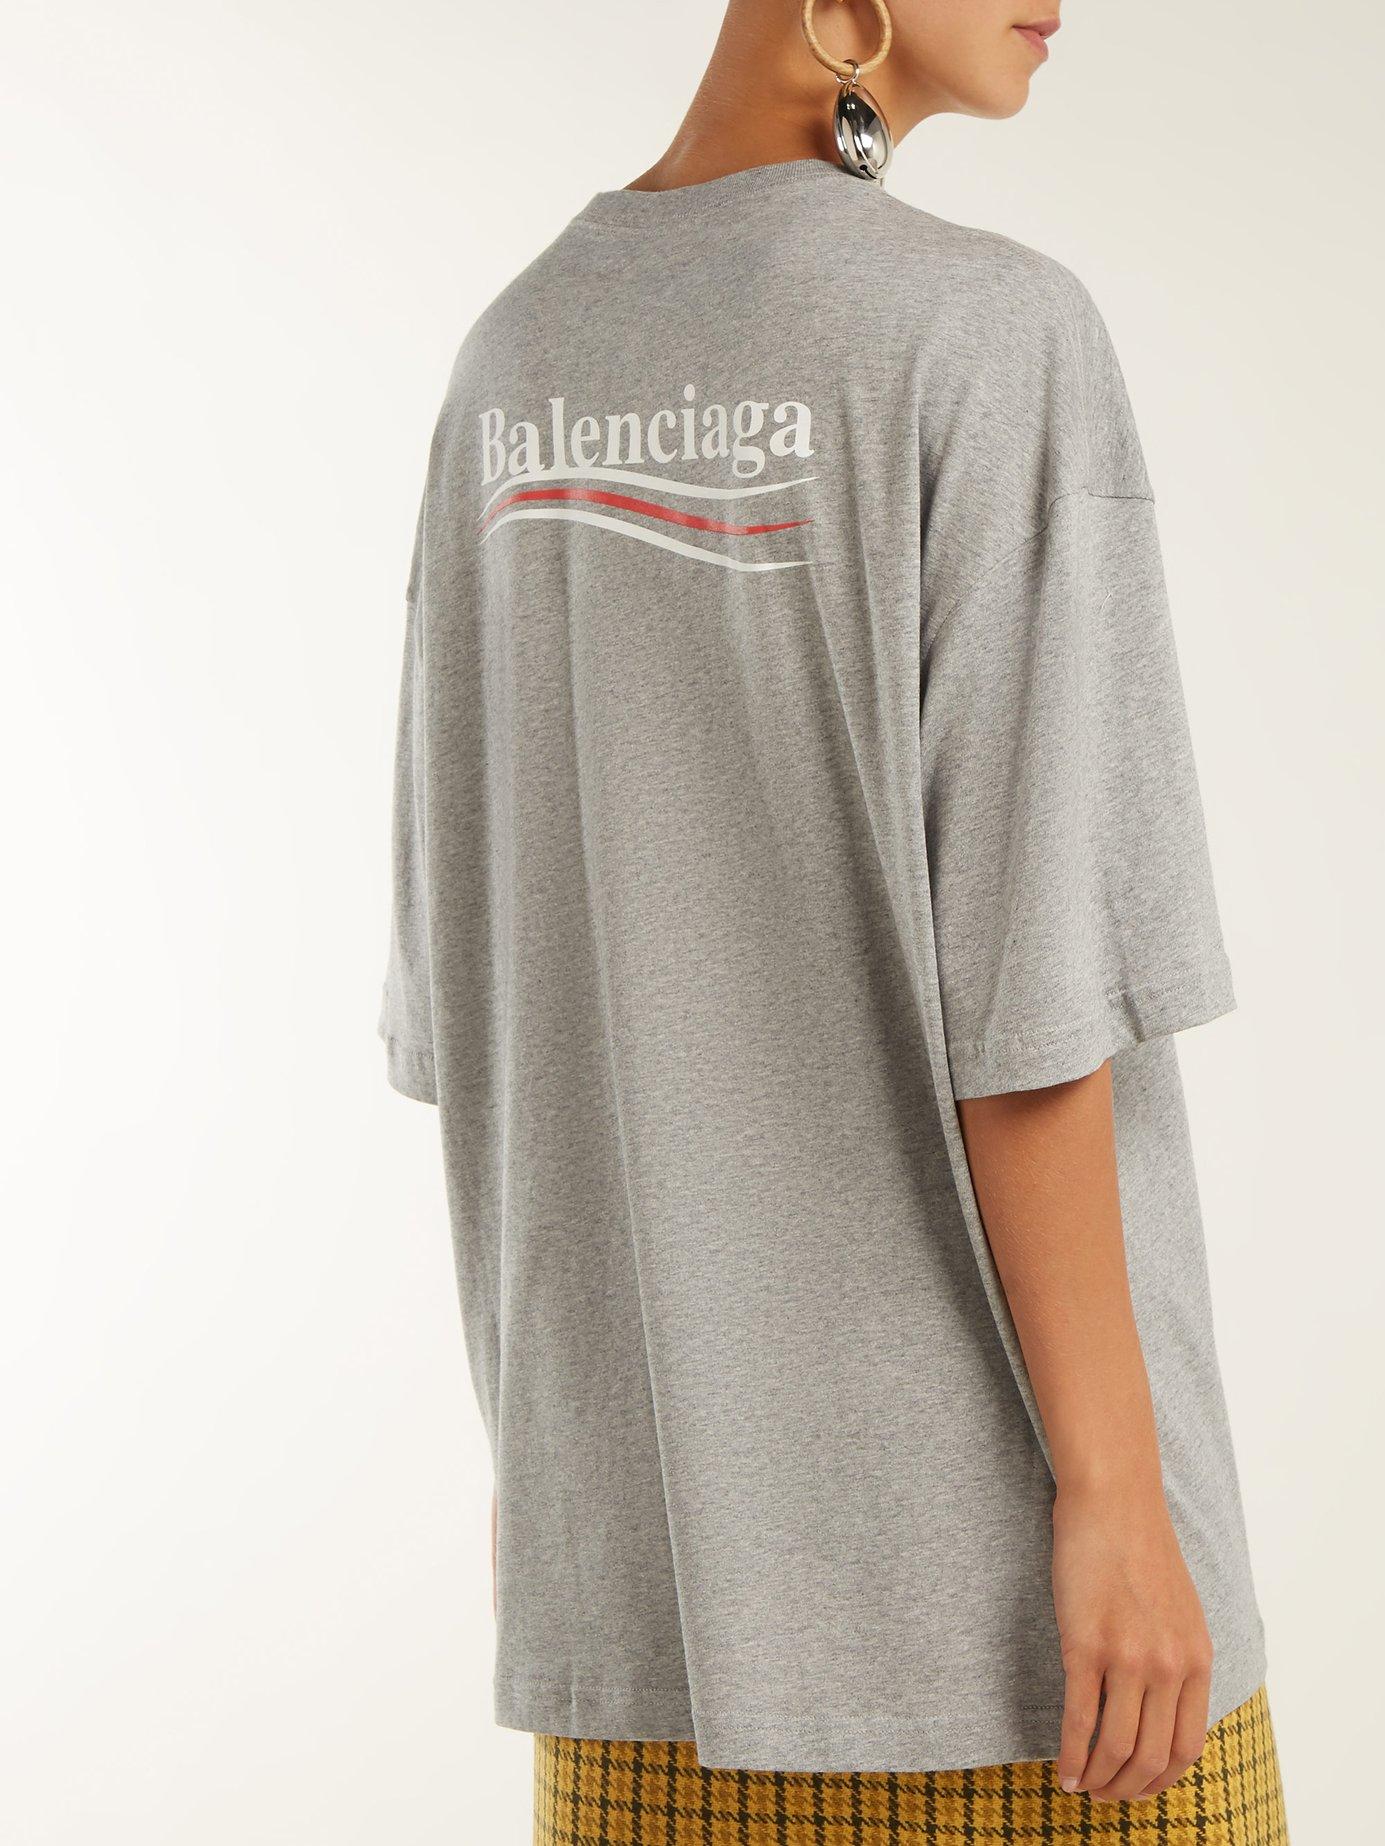 Oversized logo-print stretch cotton-jersey T-shirt by Balenciaga